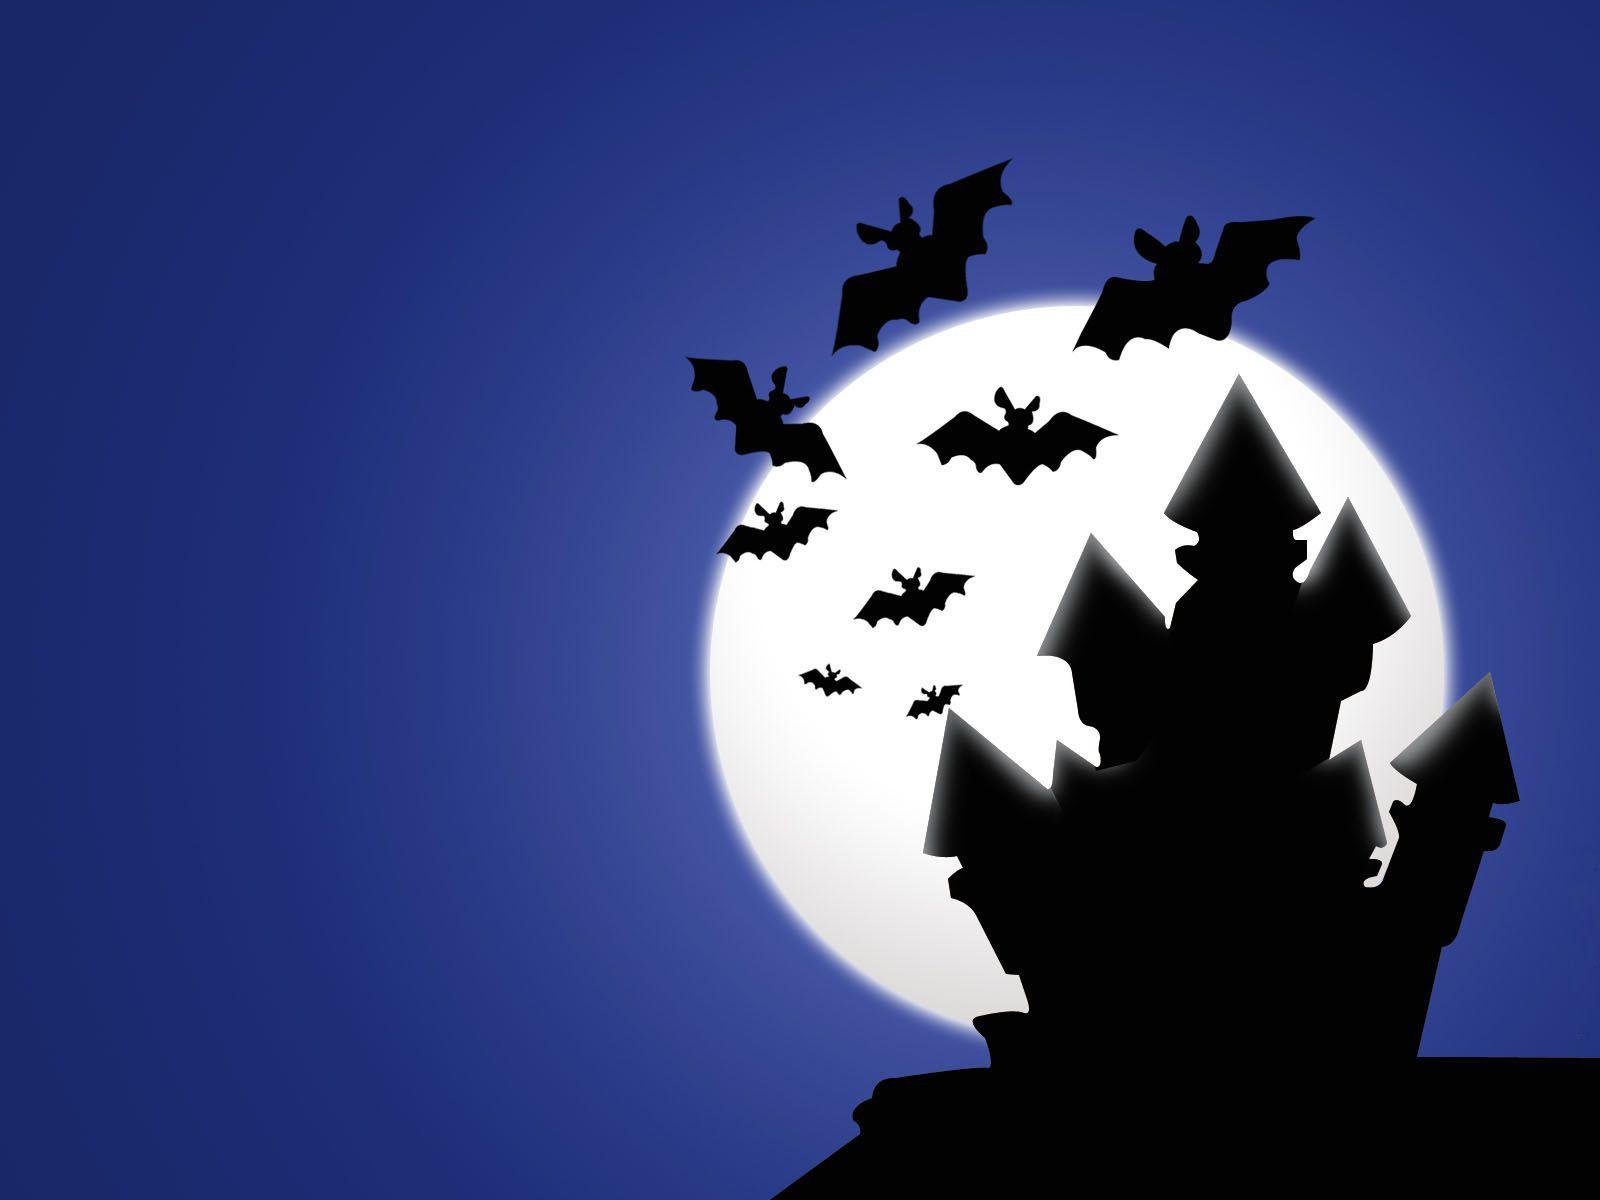 Halloween templates beautiful hd halloween wallpaper and halloween templates beautiful hd halloween wallpaper and powerpoint templates free toneelgroepblik Image collections